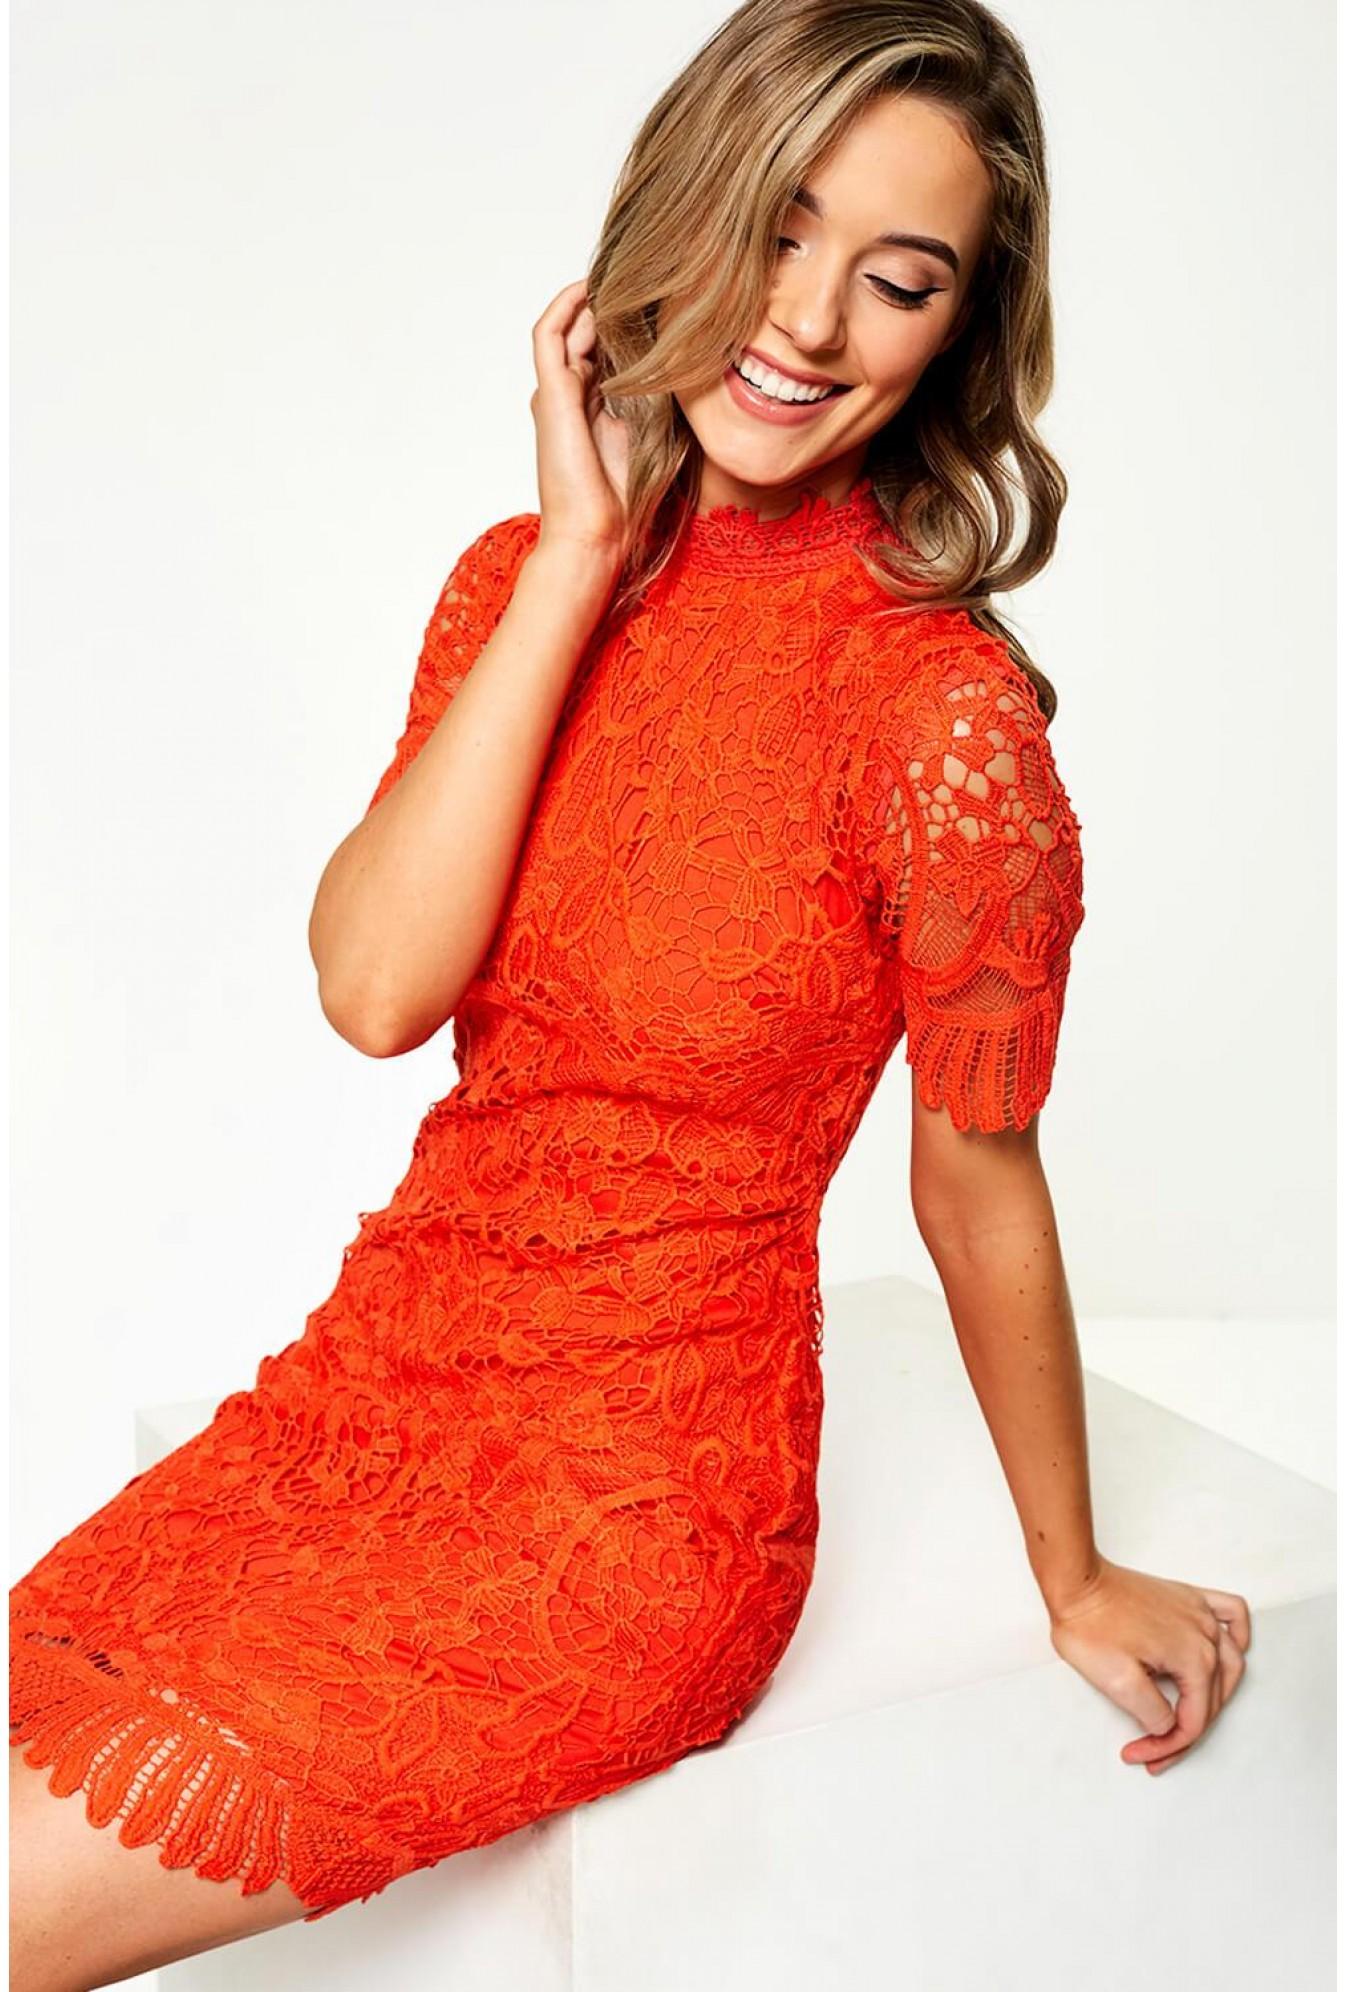 Pixie Daisy Diana Crochet Overlay Midi Dress In Orange Iclothing